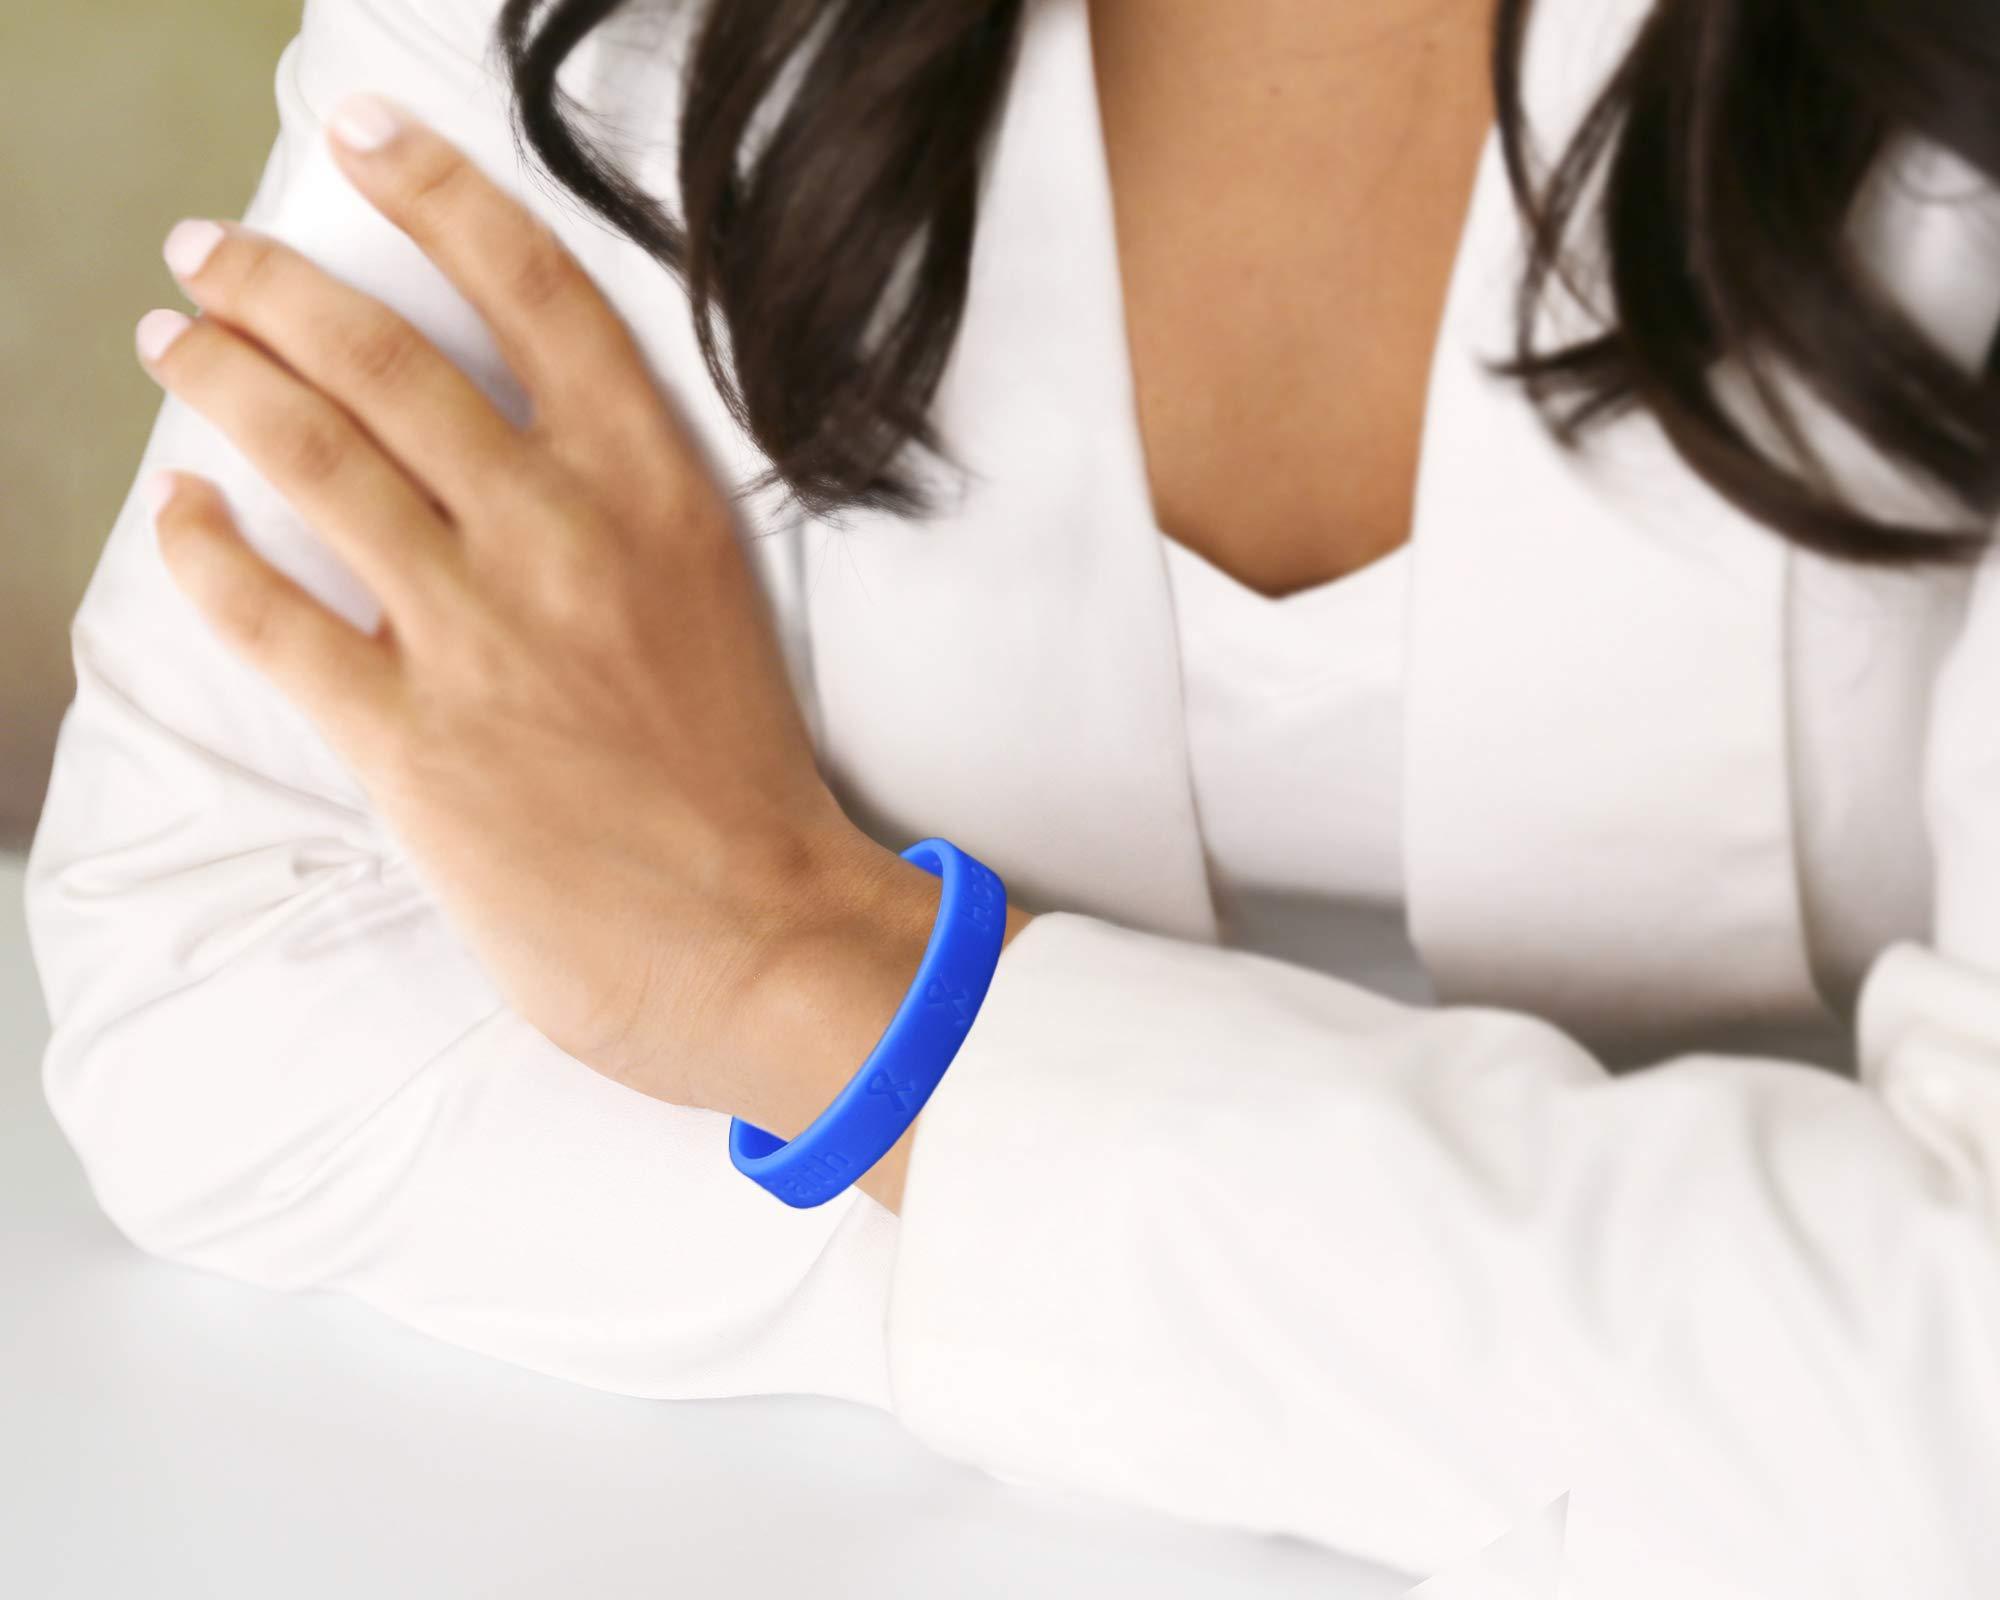 50 Pack Periwinkle Silicone Bracelets - Adult Size (Wholesale Pack - 50 Bracelets)